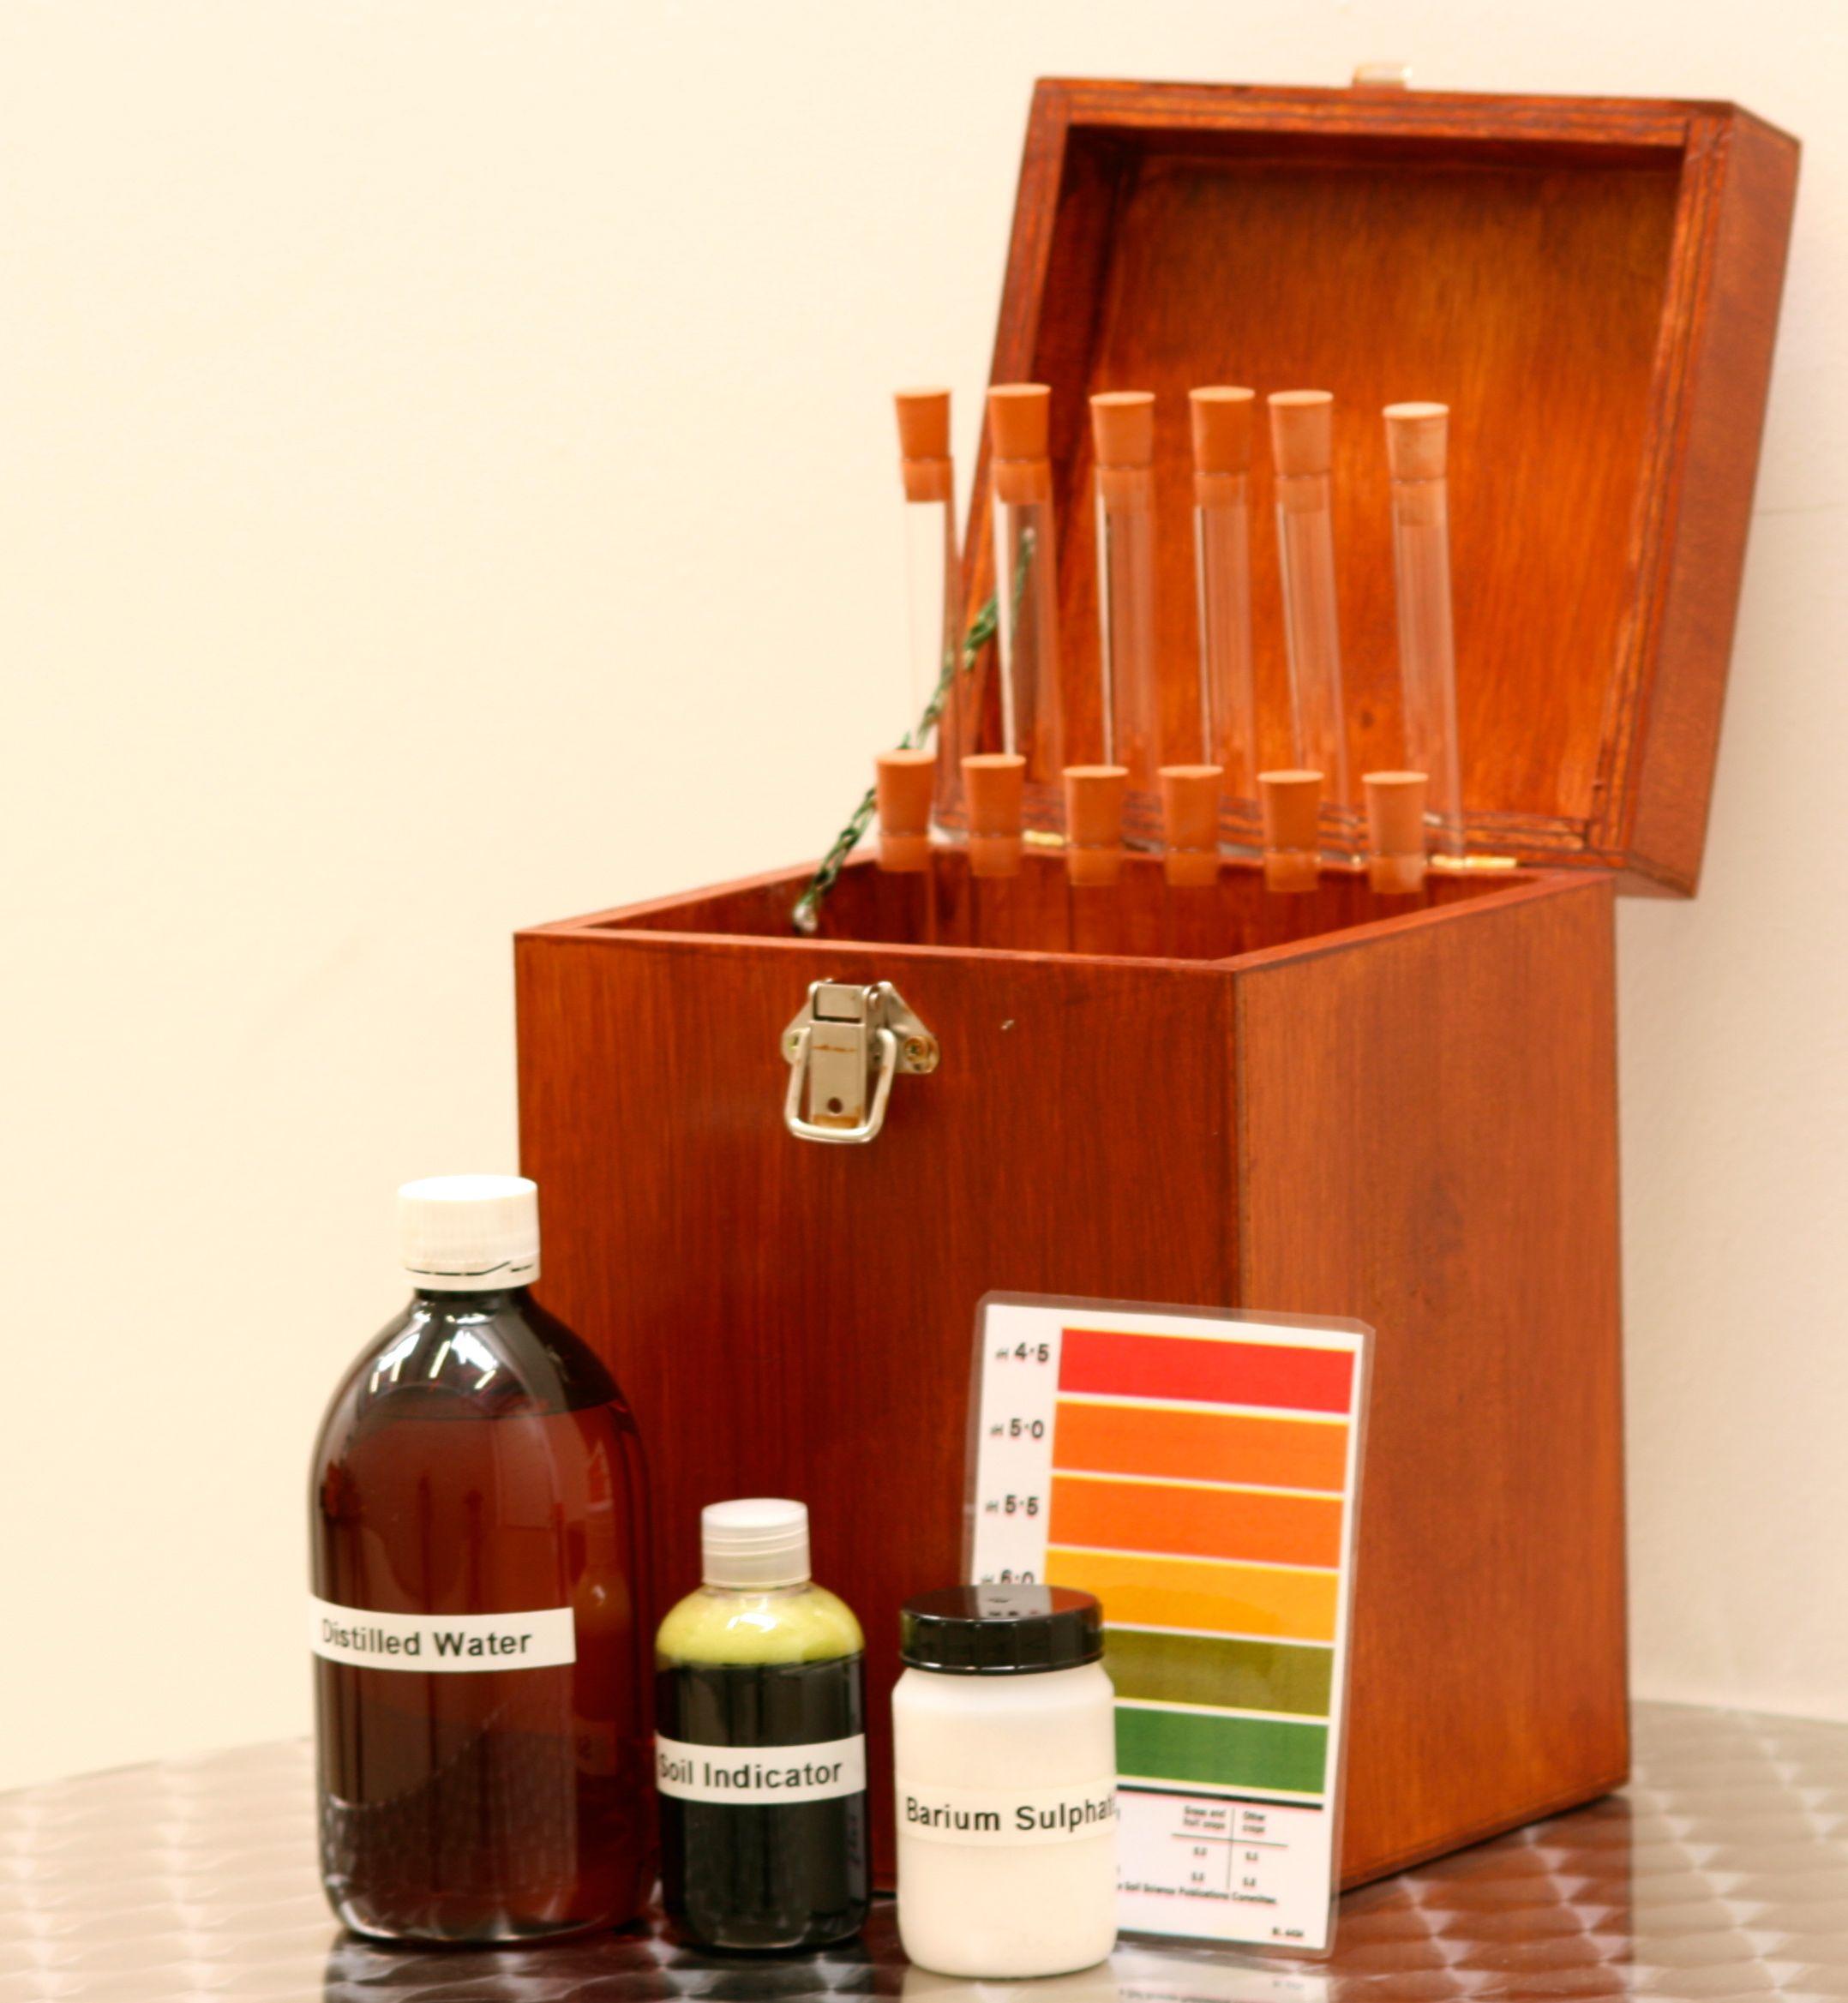 mount liming buy a soil ph testing kit. Black Bedroom Furniture Sets. Home Design Ideas